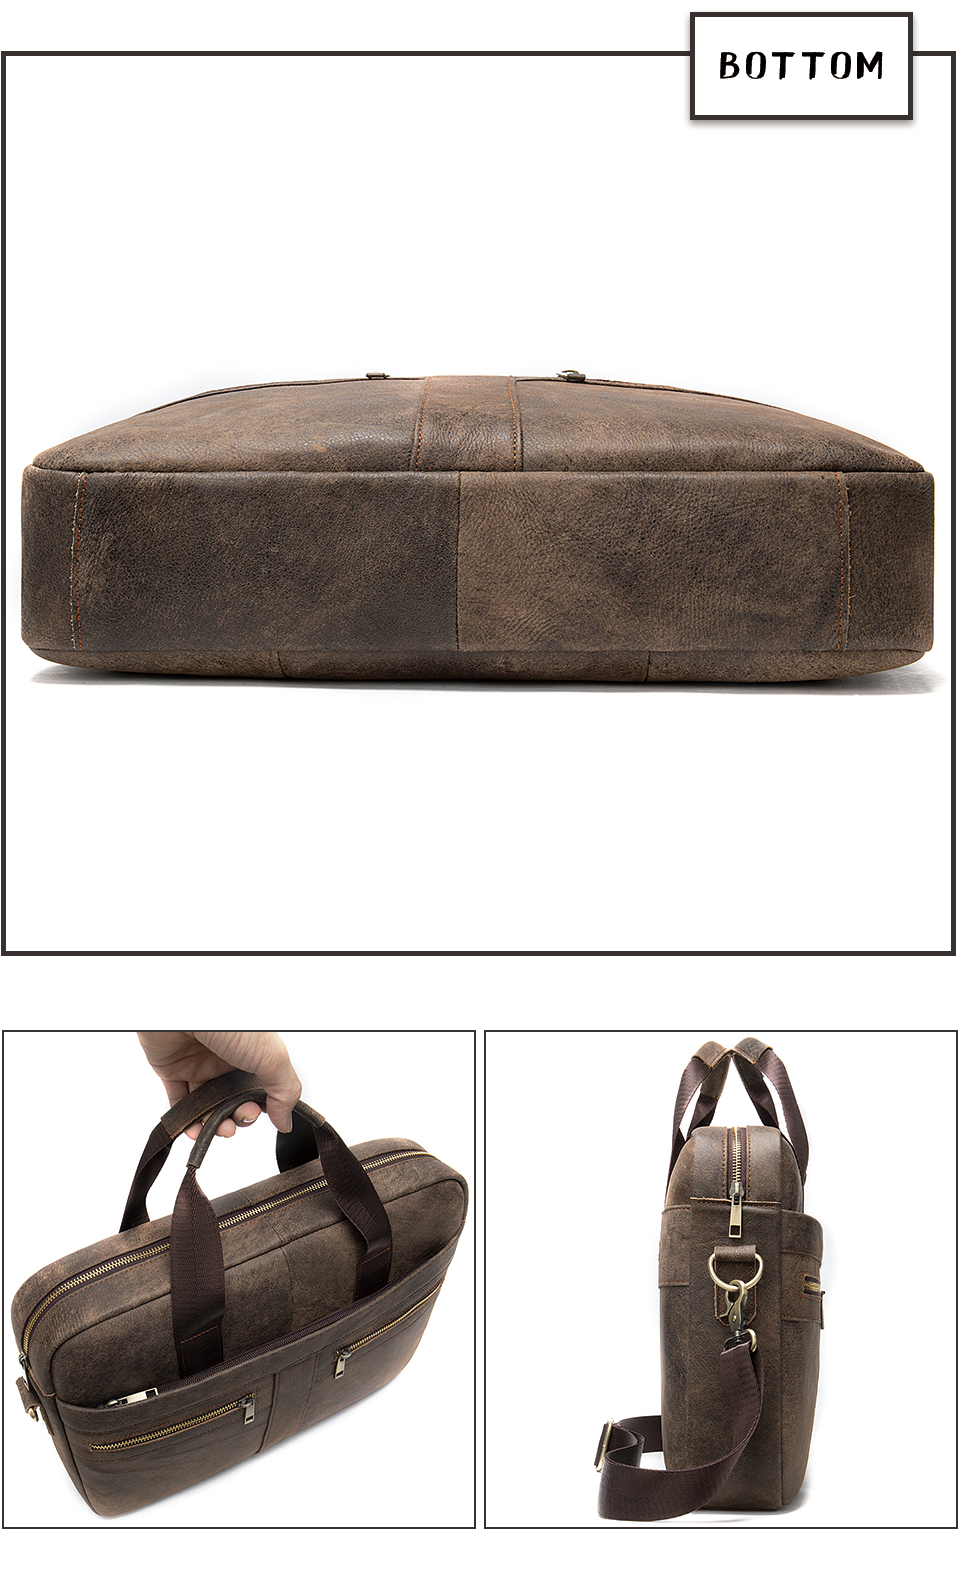 HTB1oo3Ca7T2gK0jSZPcq6AKkpXaY WESTAL Bag men's Genuine Leather briefcase Male man laptop bag natural Leather for men Messenger bags men's briefcases 2019